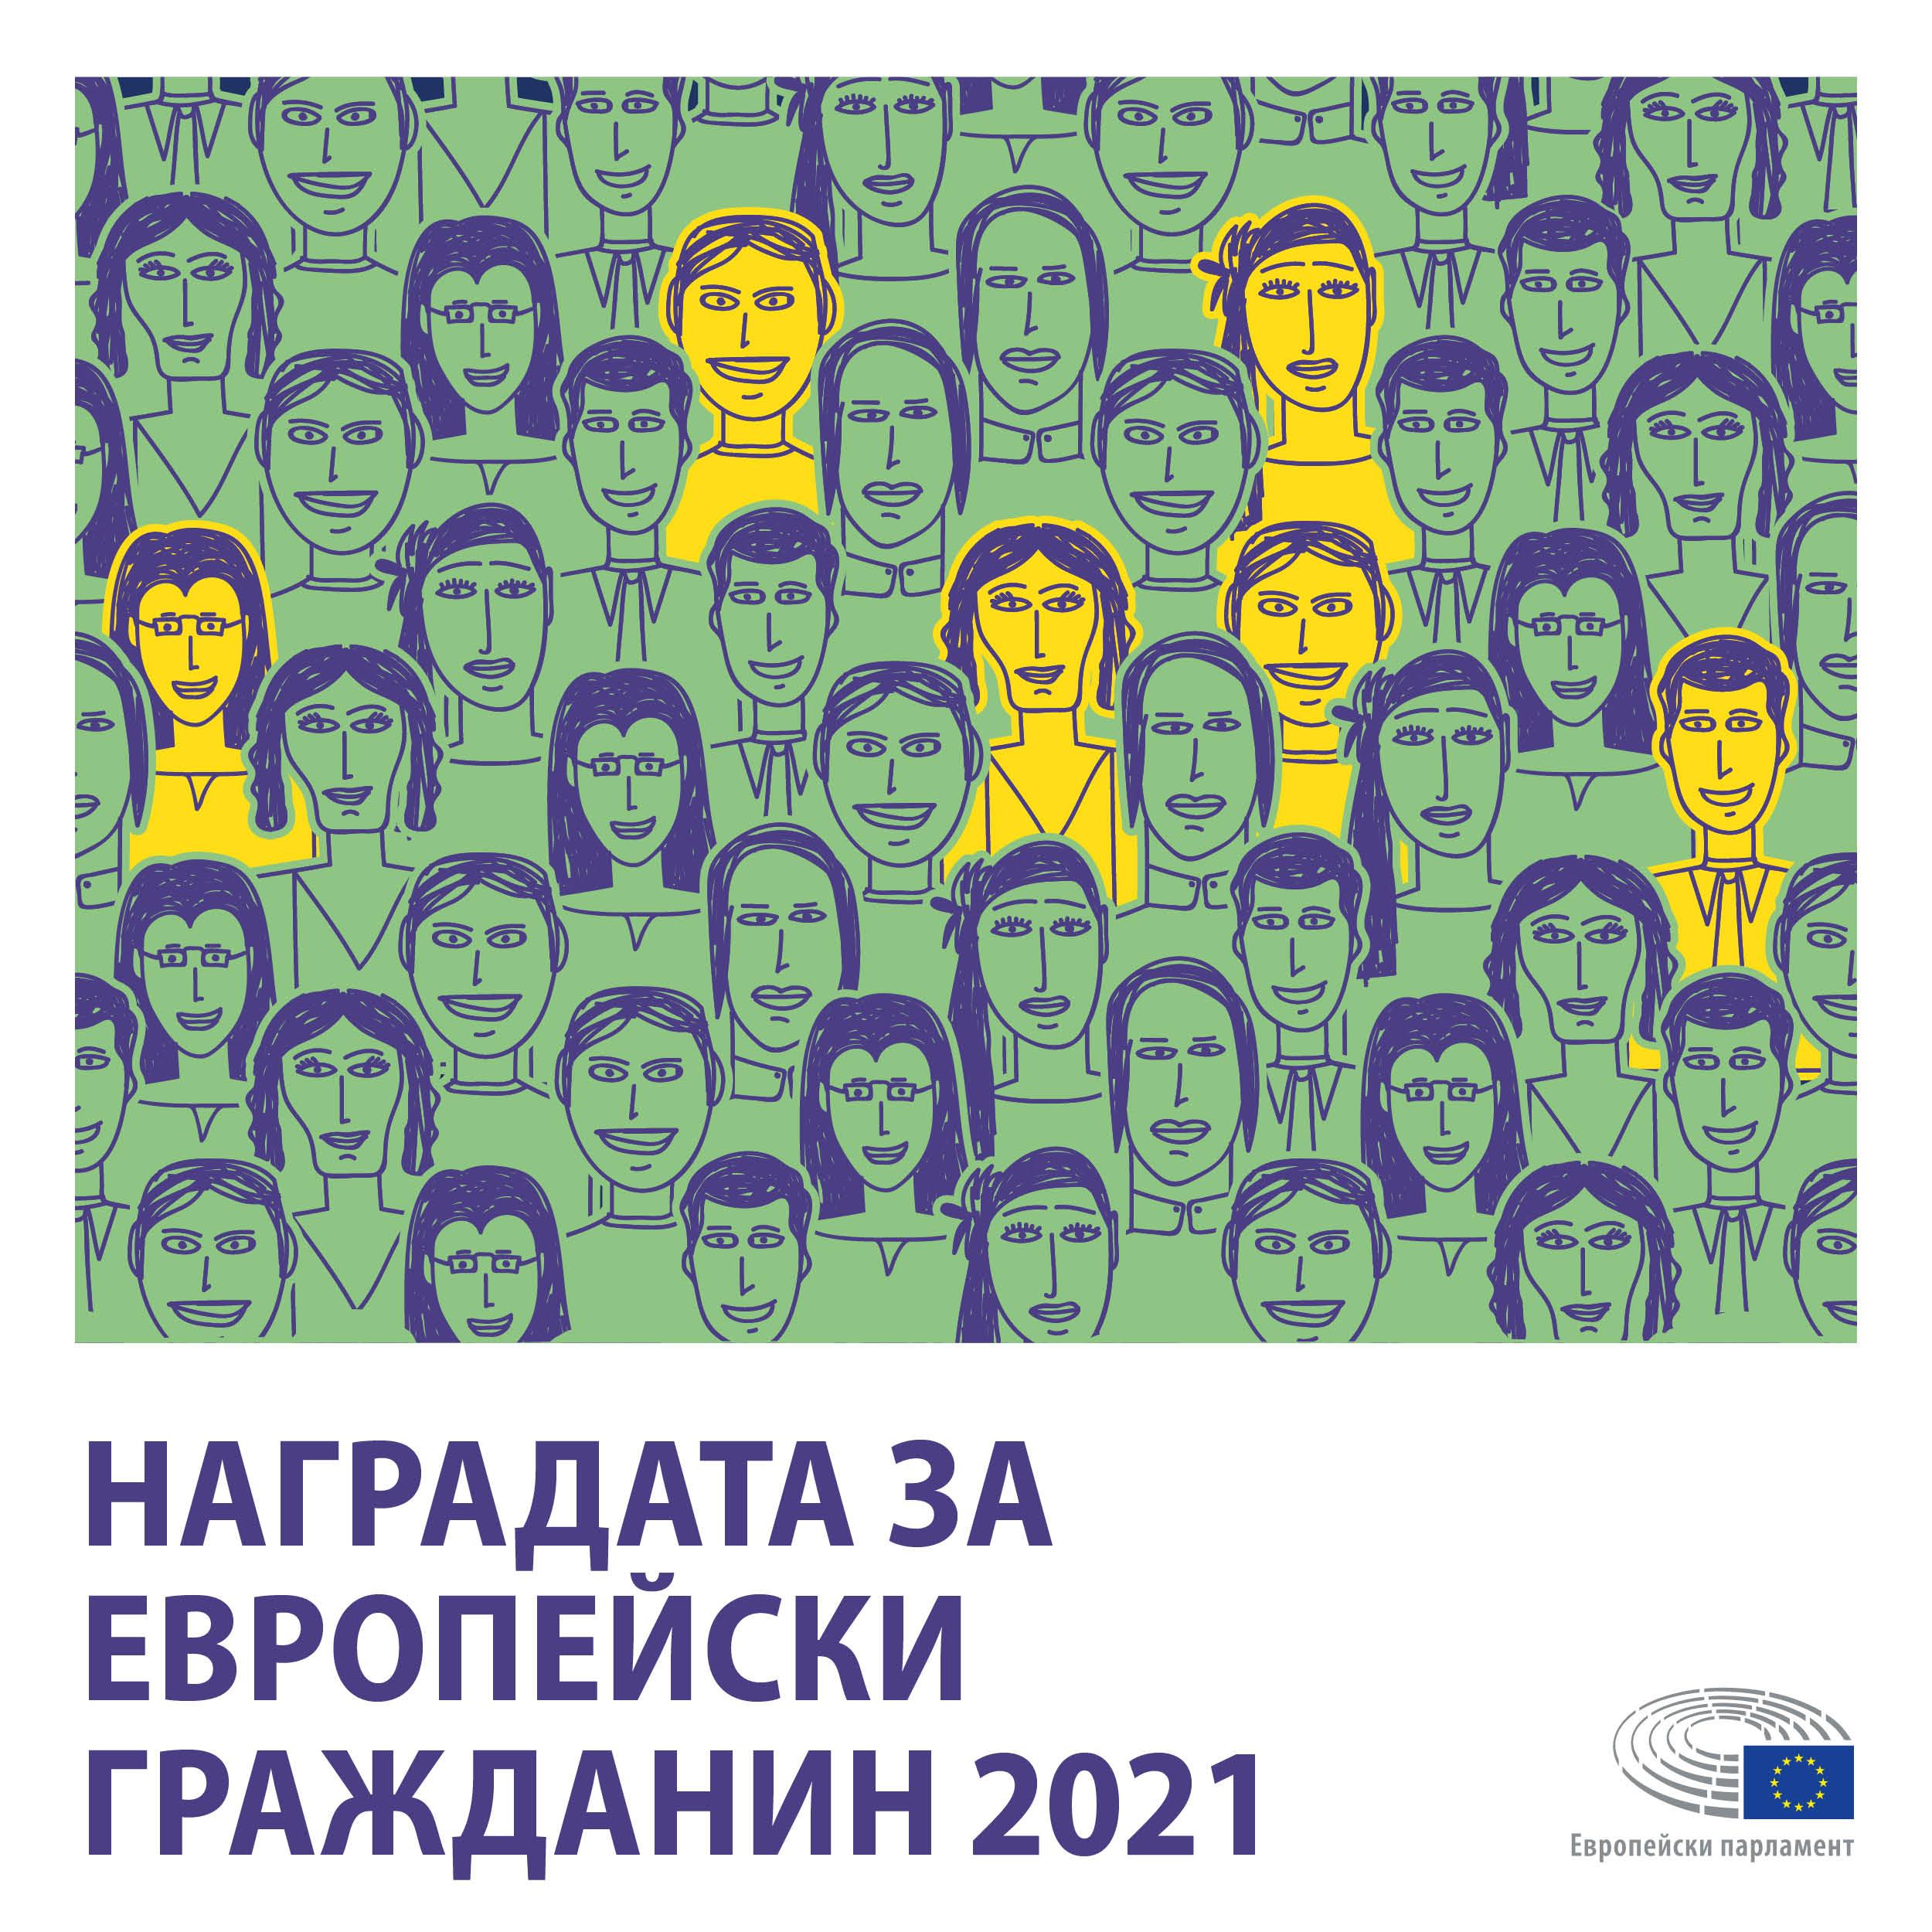 TheMayor.EU wins the 2021 European Citizen's Prize